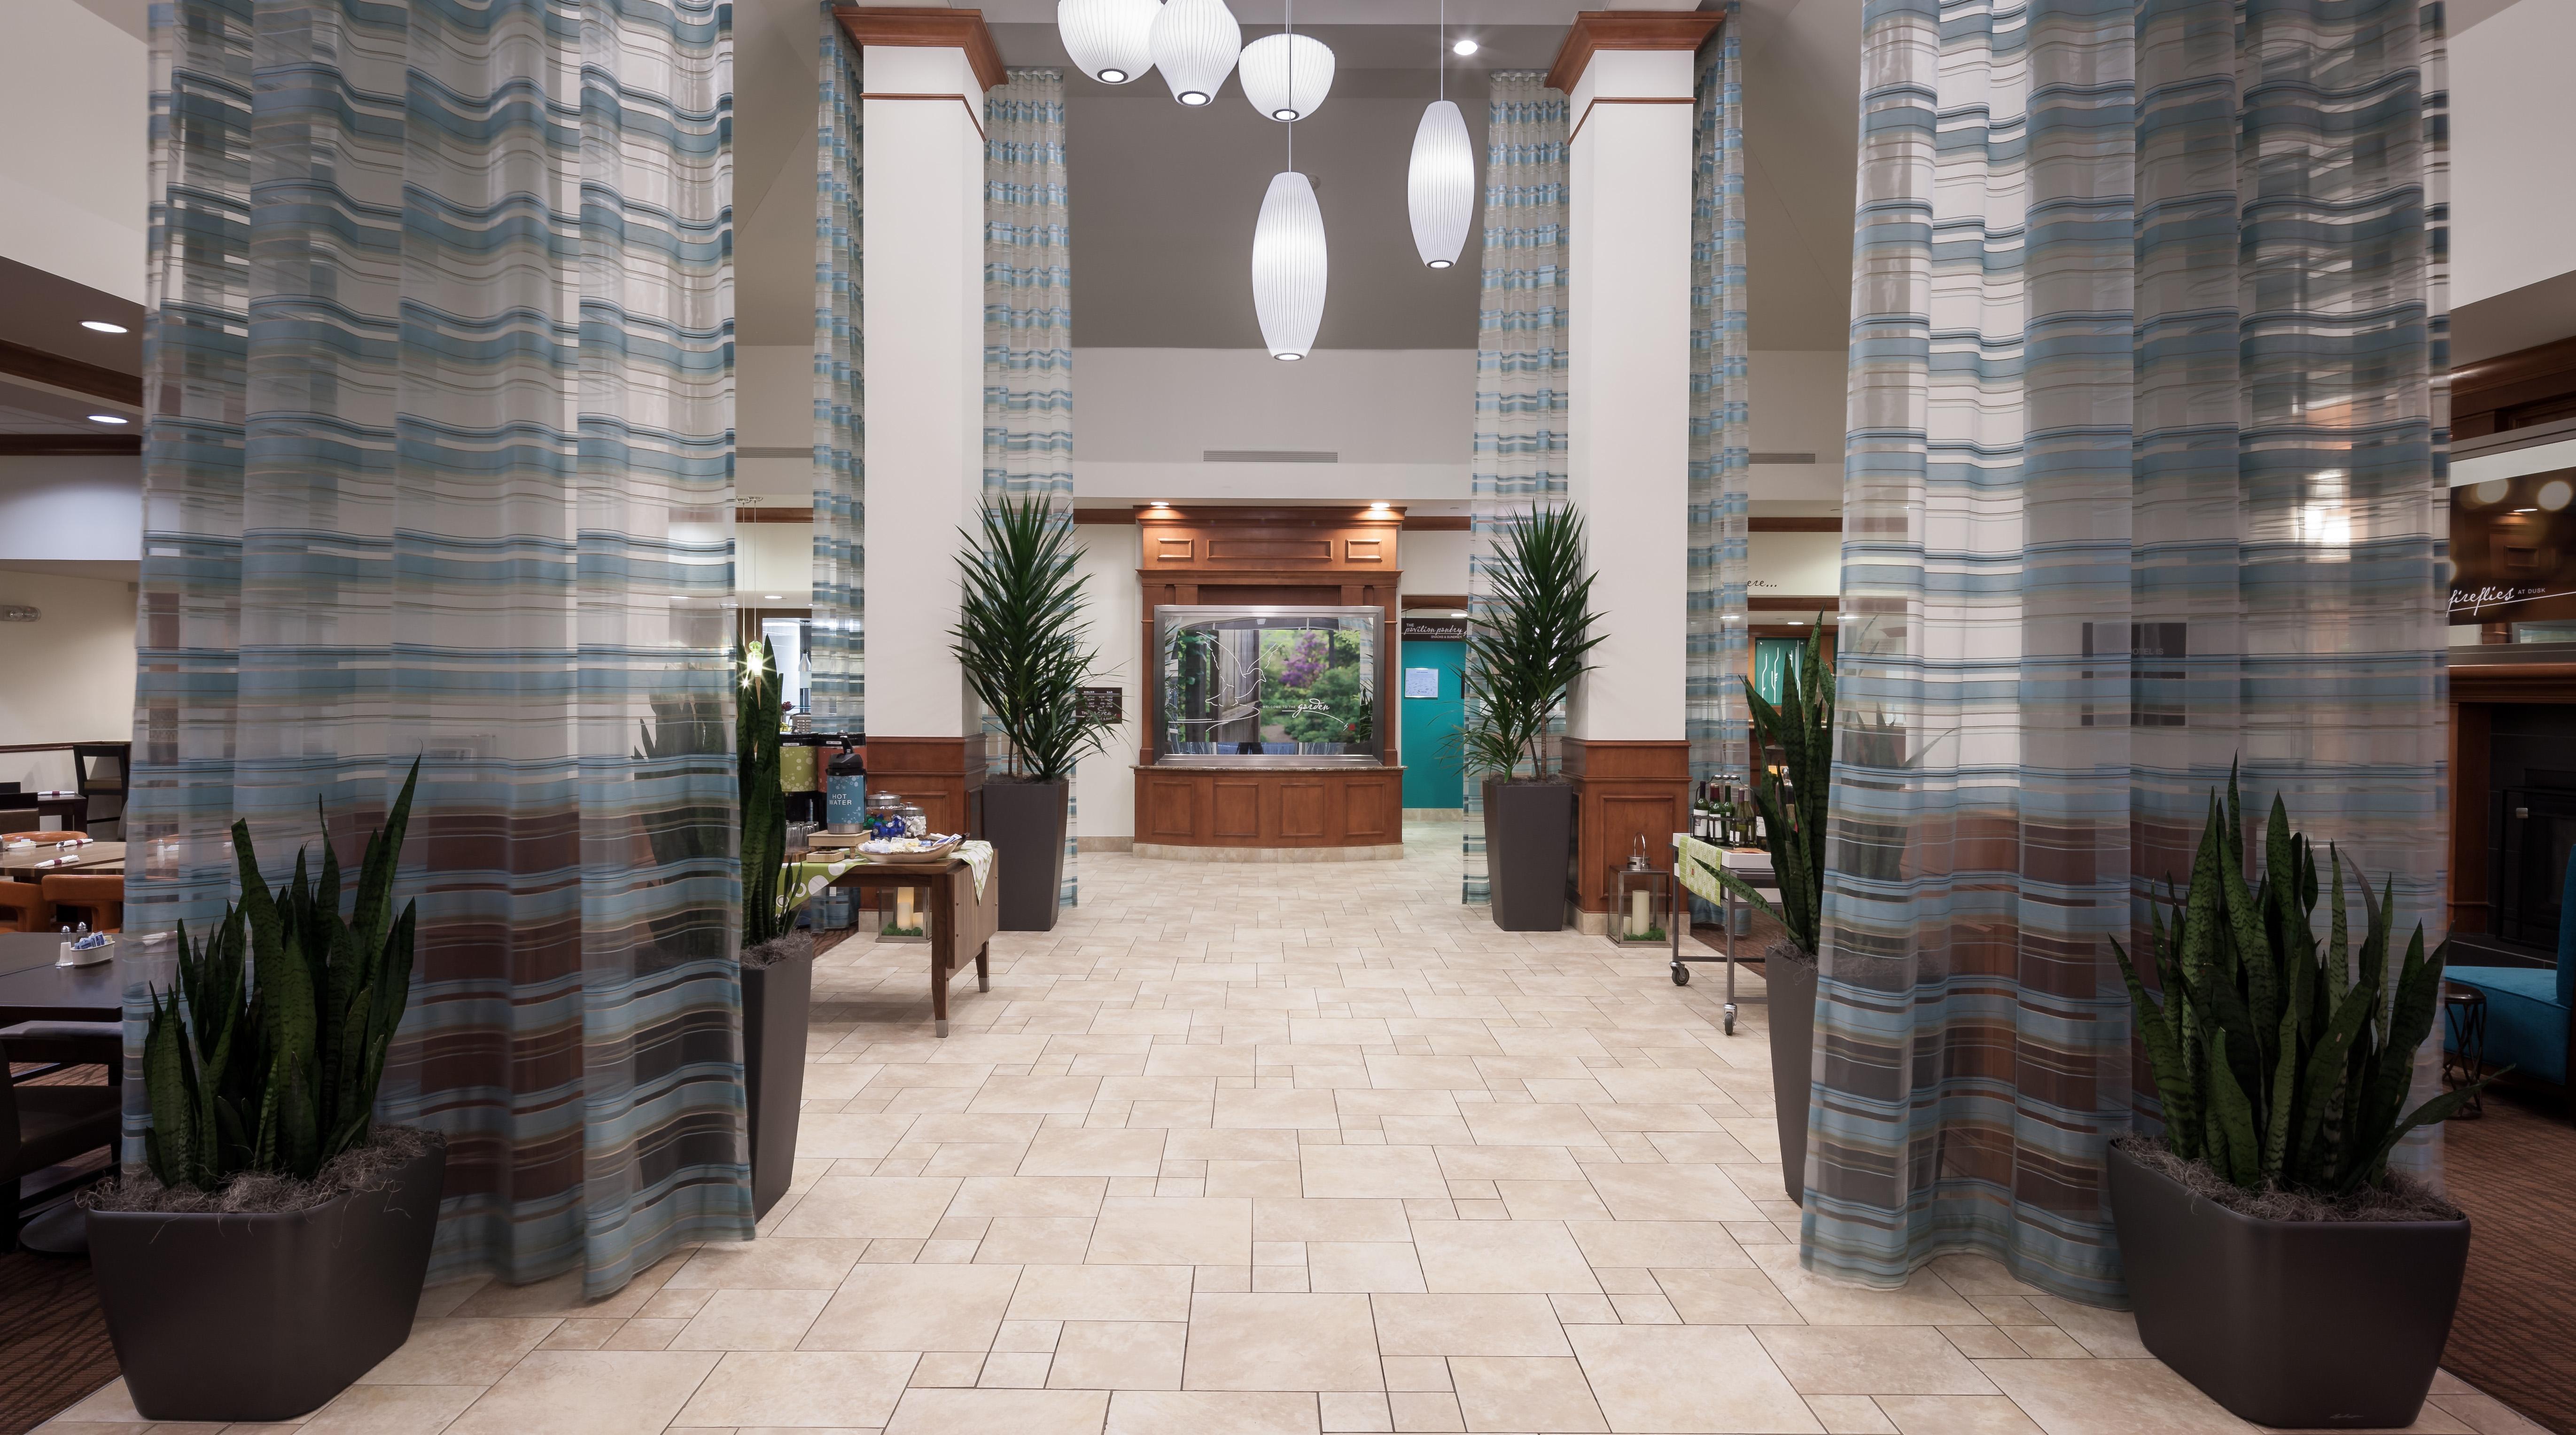 Hilton Garden Inn Minneapolis / Maple Grove